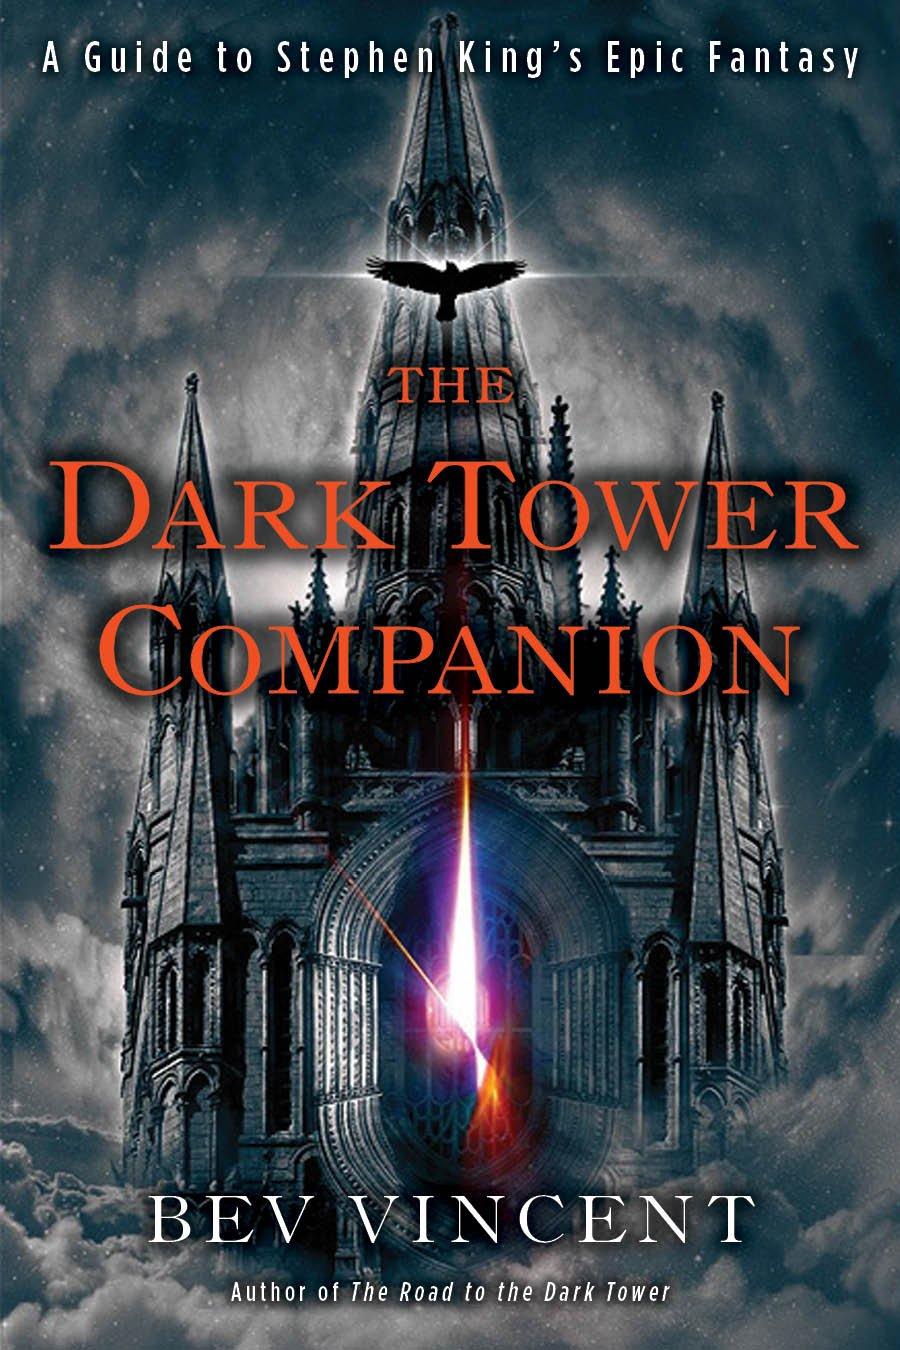 [thedarktower companion bevvincent NAL2013 Stephen King ]